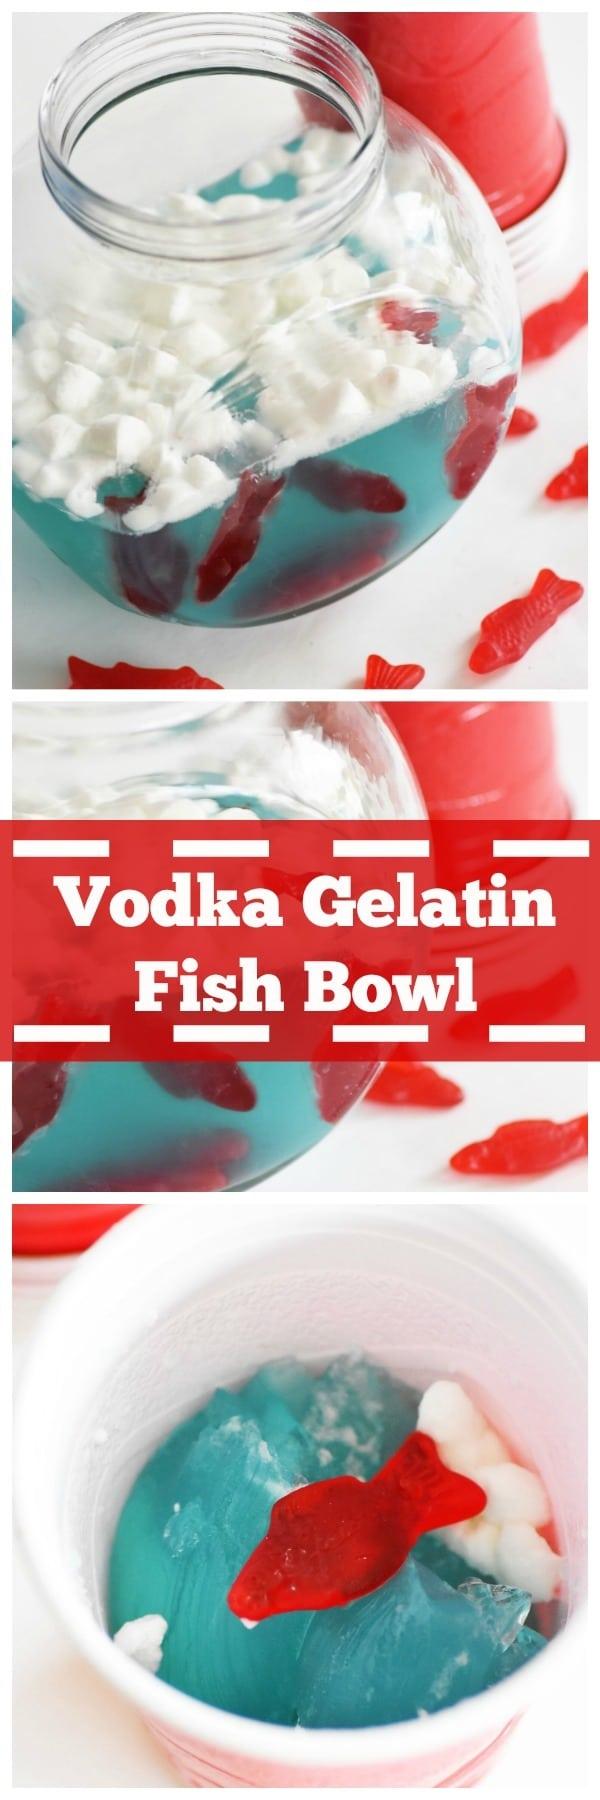 Vodka-Gelatin-Fish-Bowl1